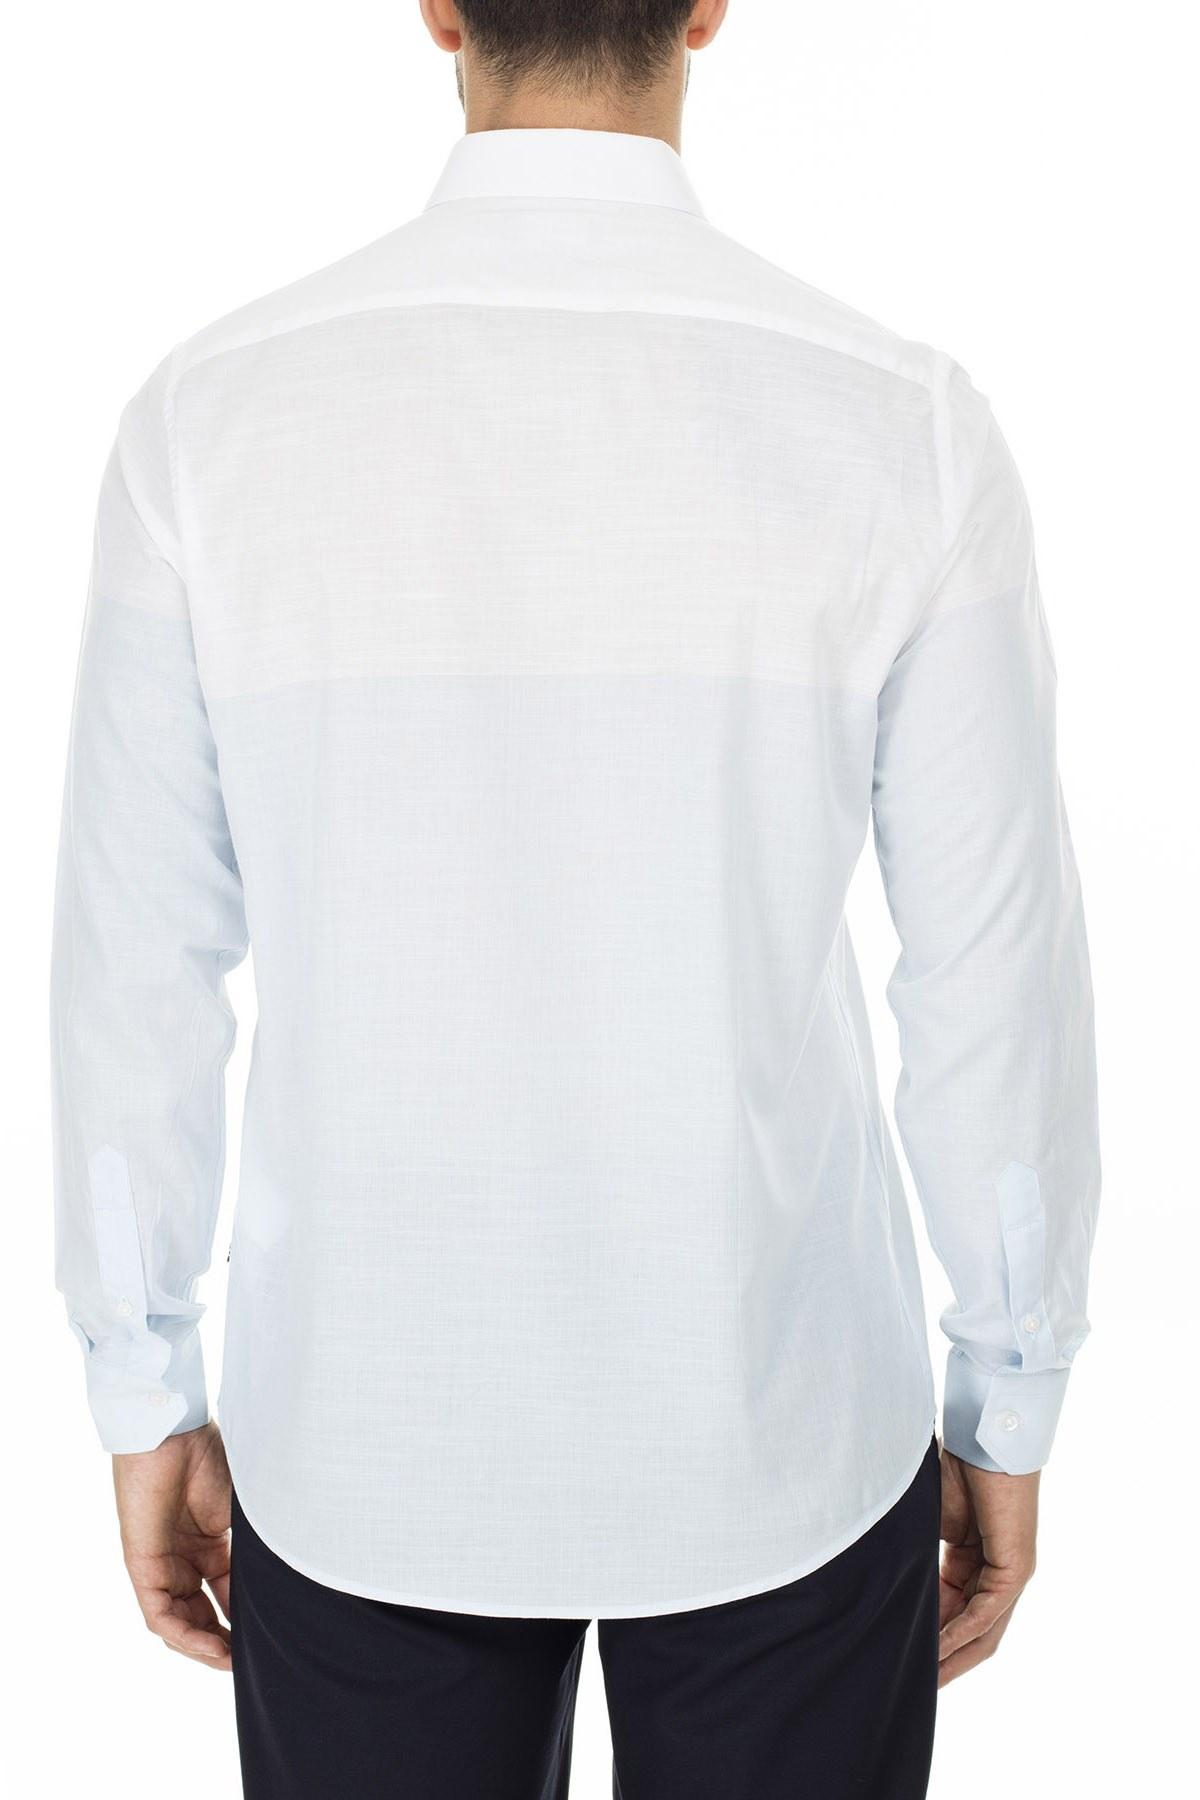 Nautica Düğmeli Yaka % 100 Pamuk Slim Fit Erkek Gömlek W91032T 4FS MAVİ